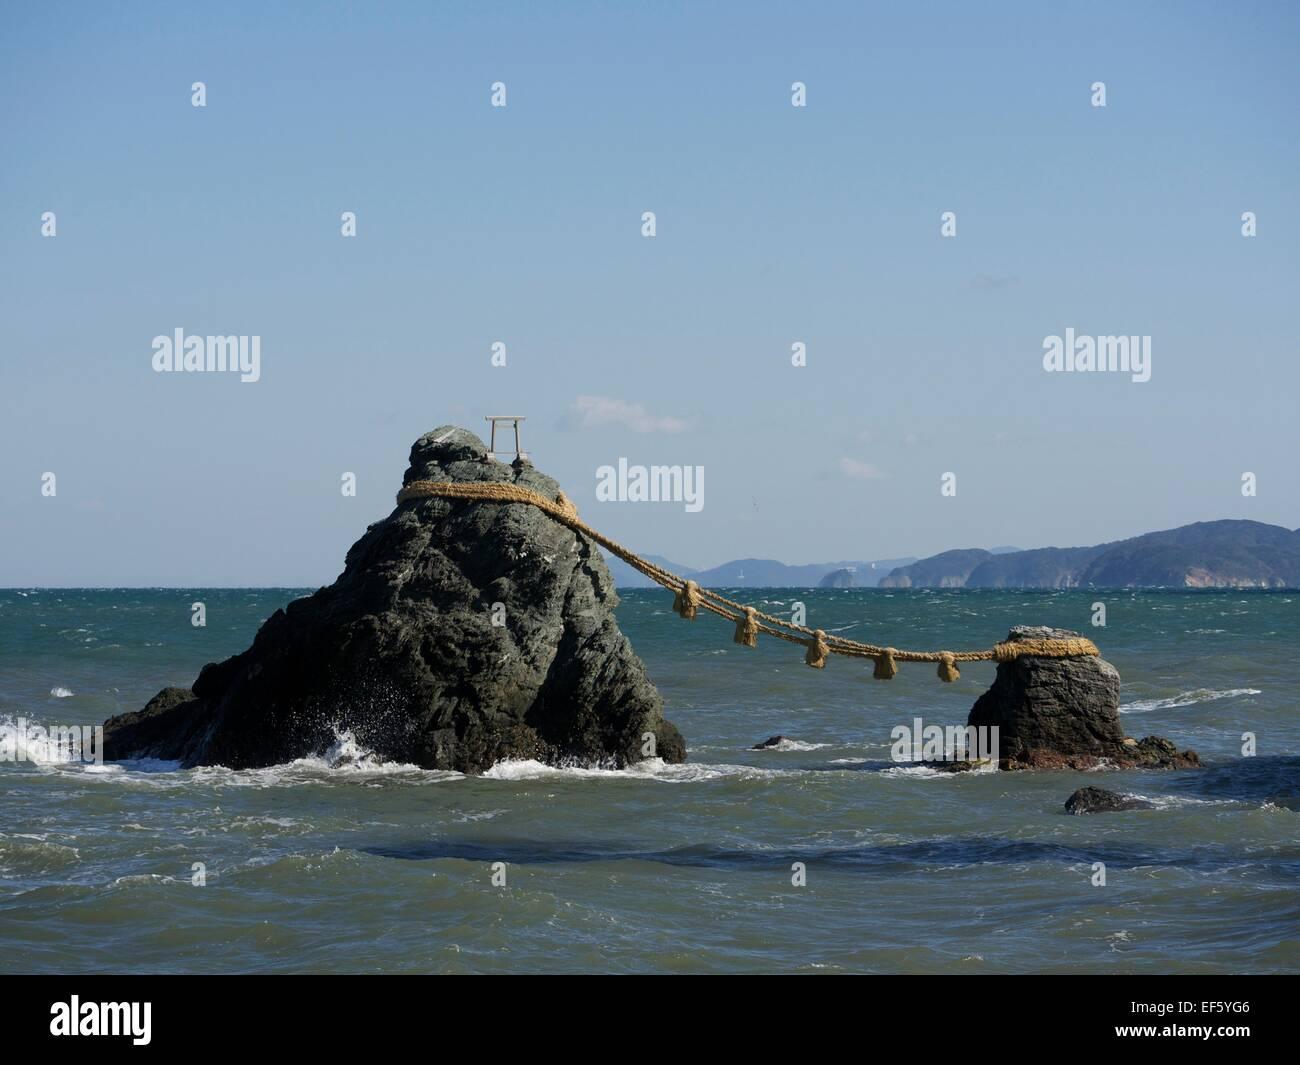 Meoto Iwa in Mie Prefecture, Japan - Stock Image